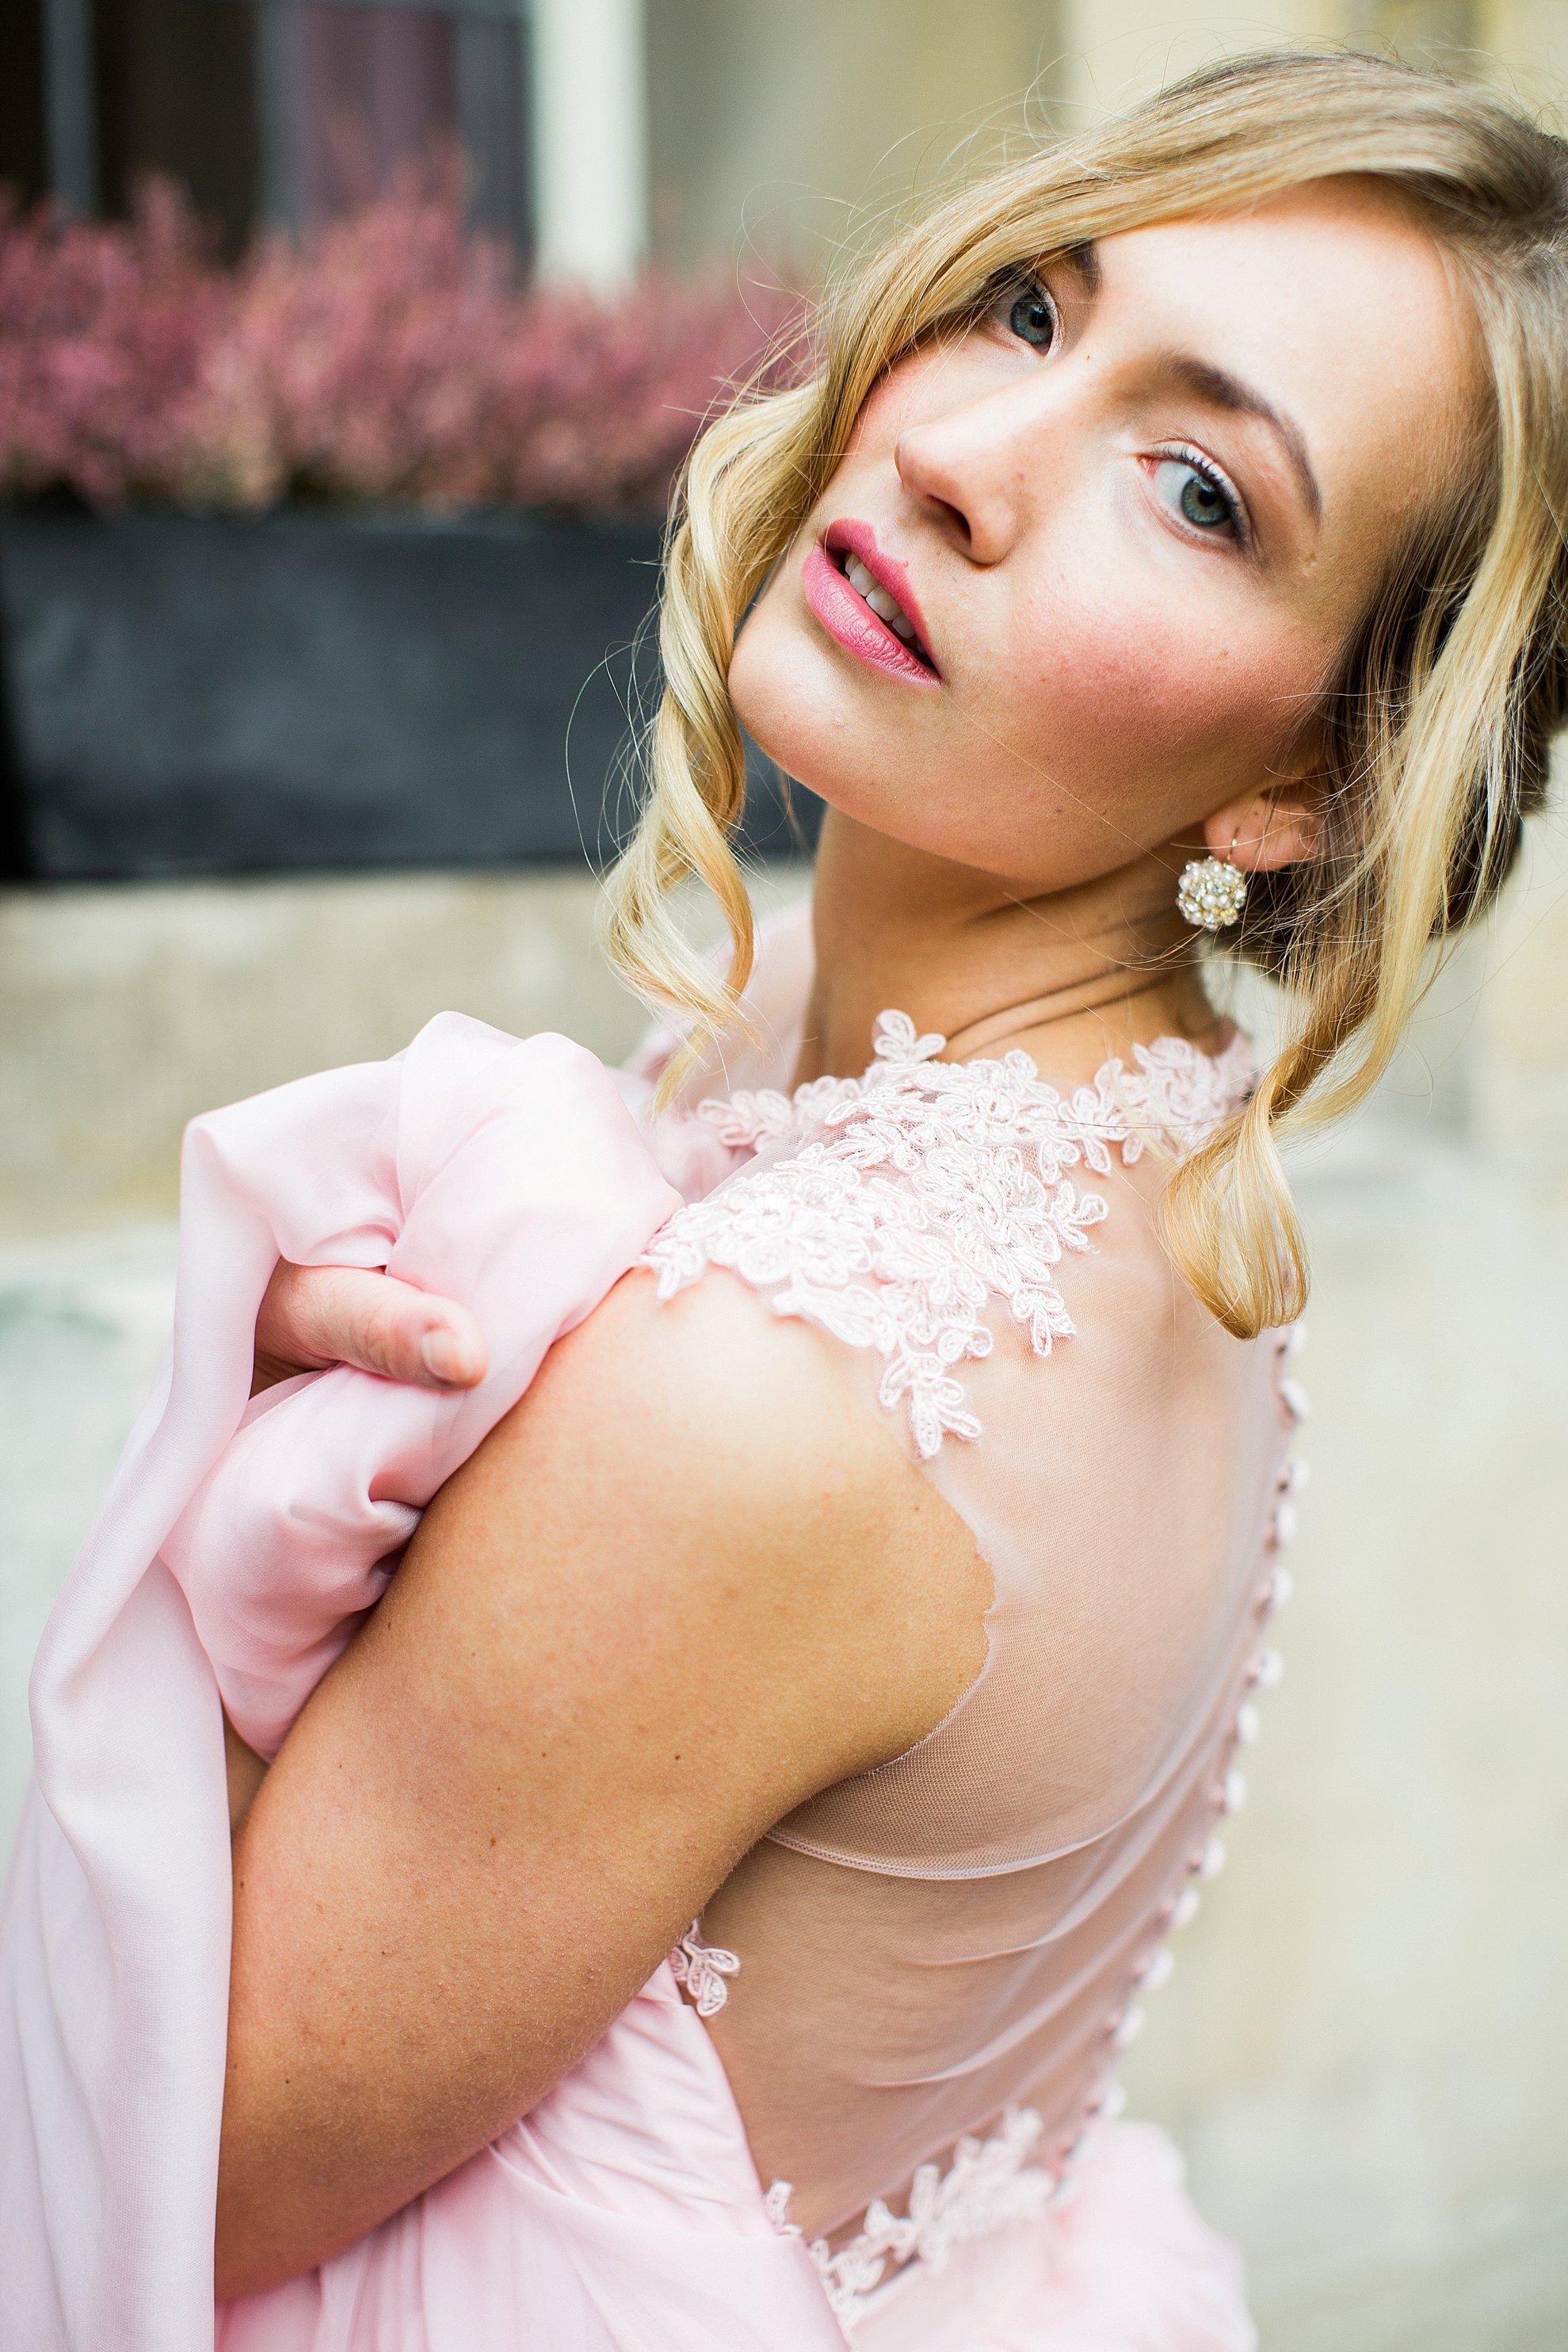 Amanda-Drost-Photography-fotografie-bruiloft-trouwen-winter-TheNetherlands_0075.jpg